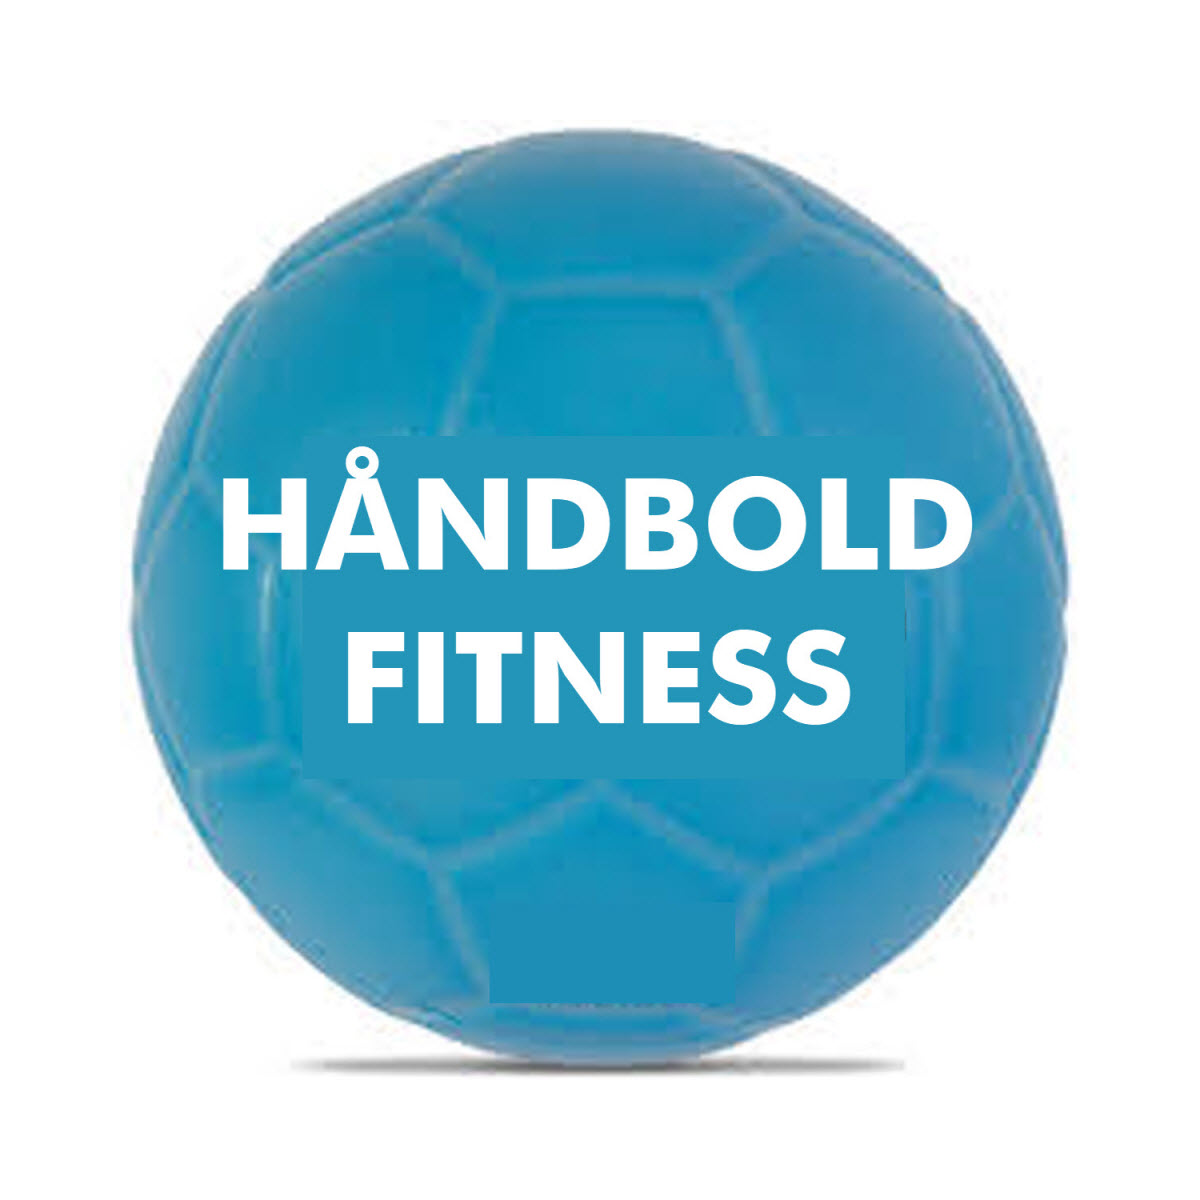 håndbold fitness